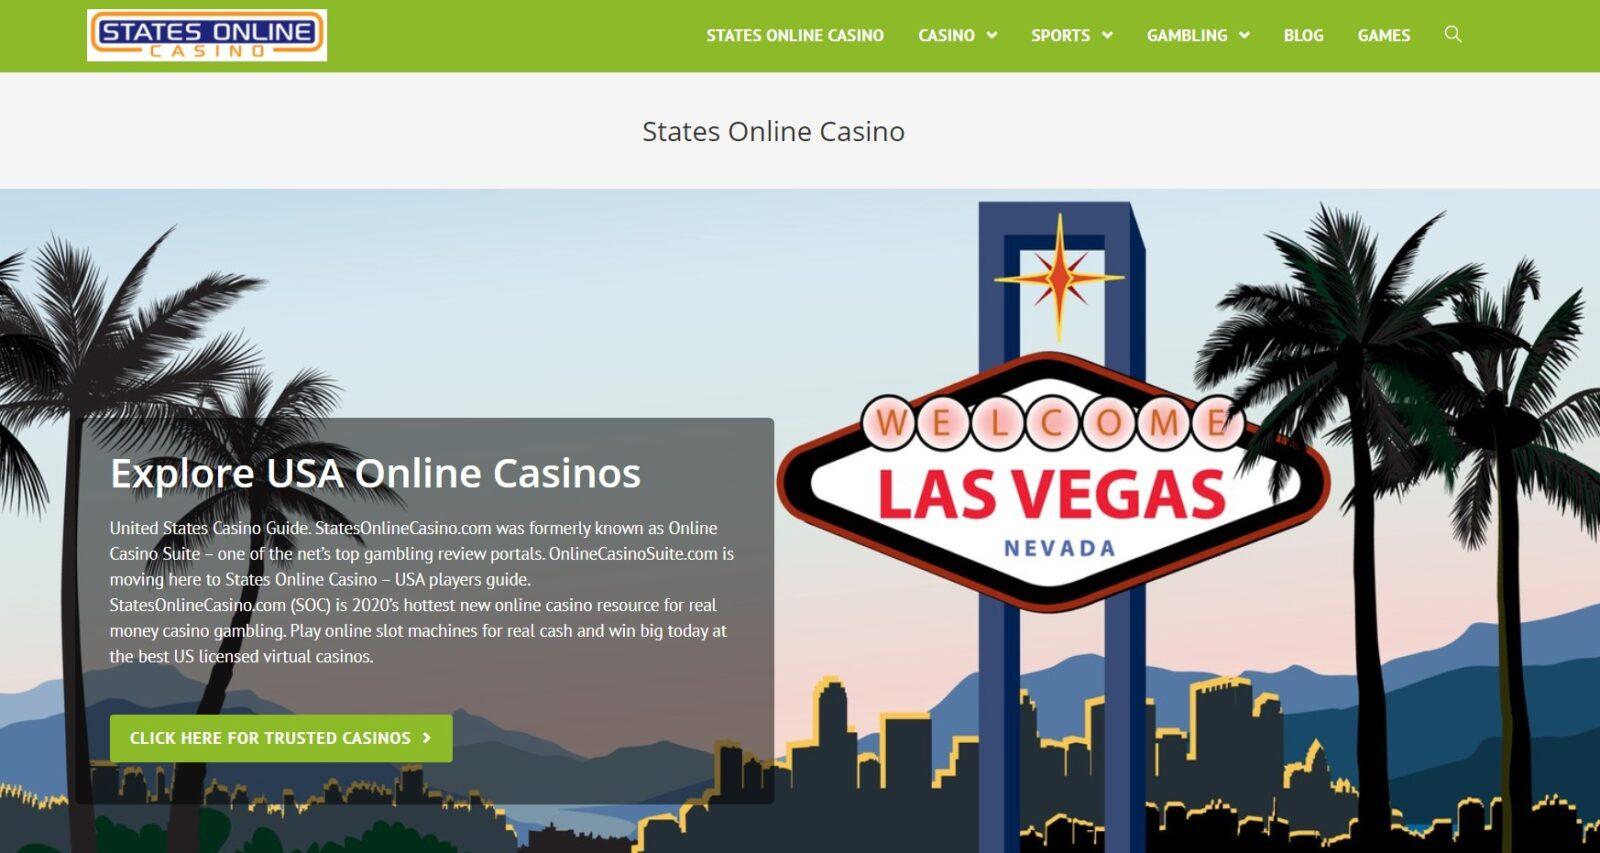 States Online Casino (SOC)